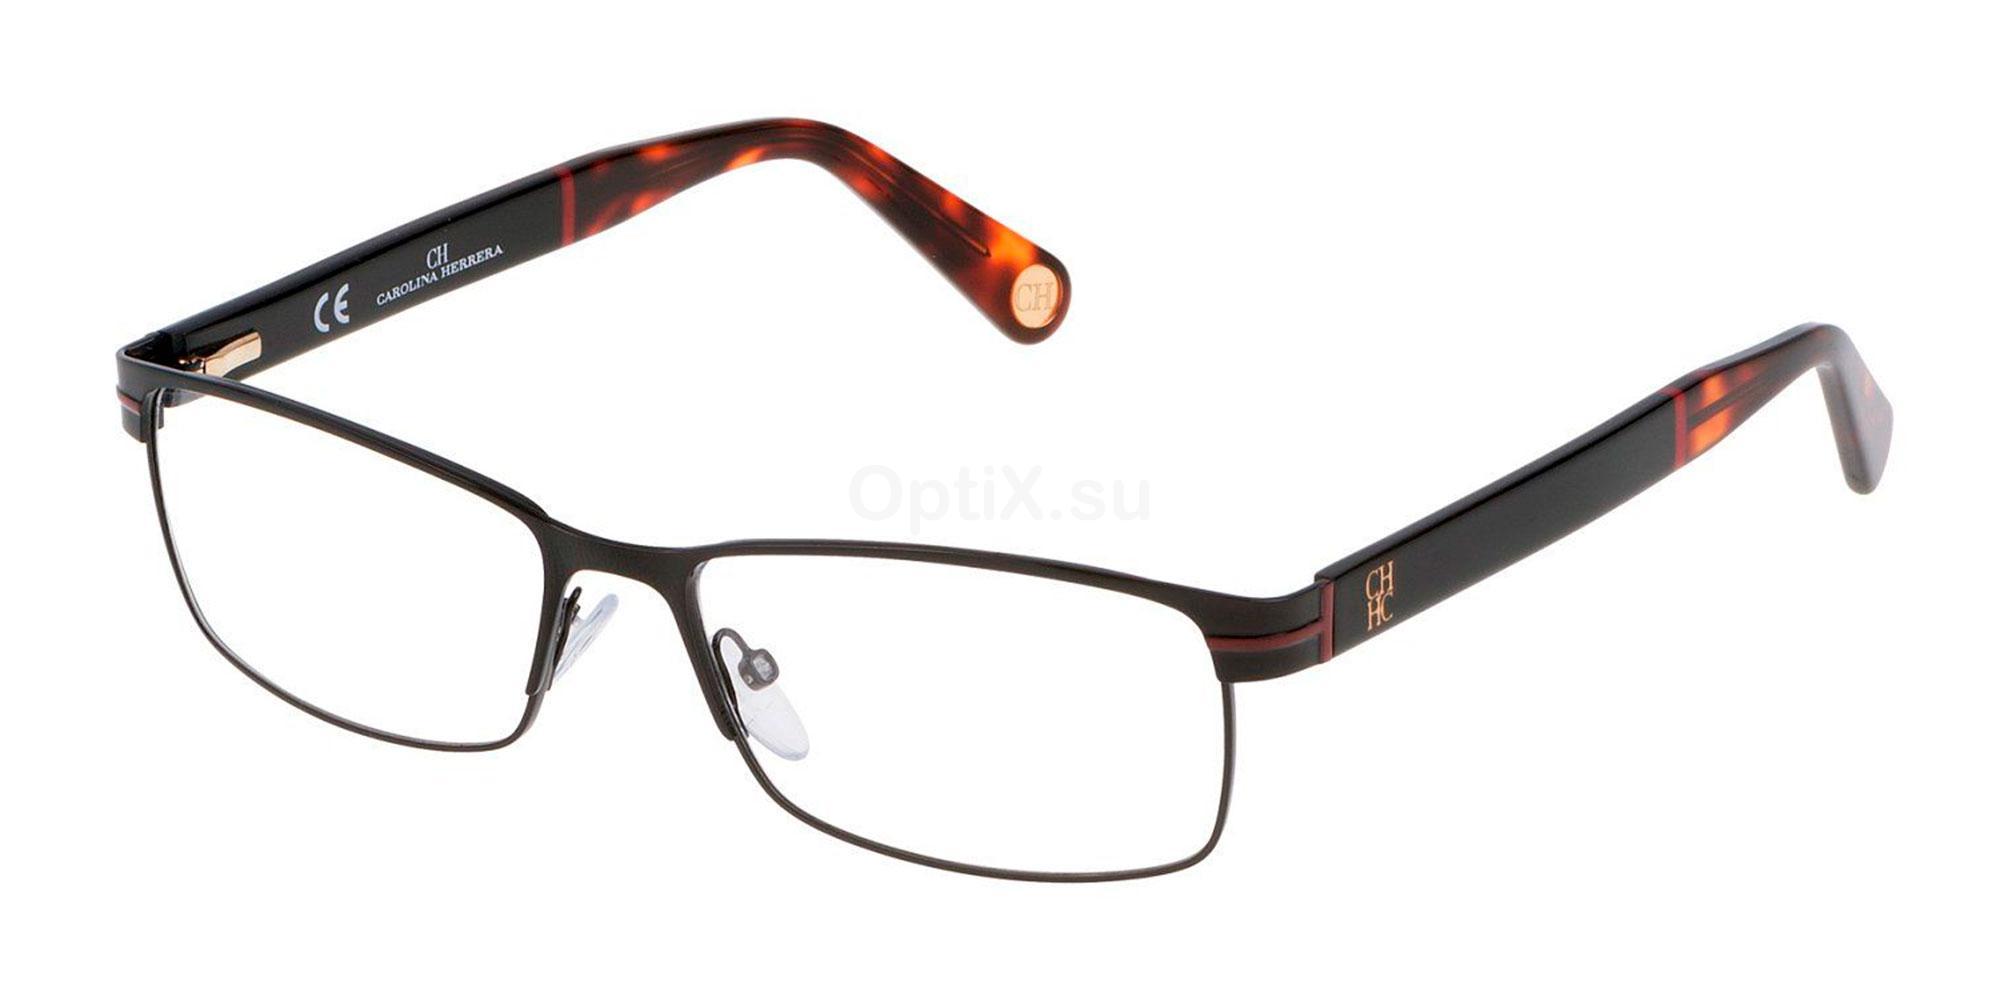 0530 VHE054 Glasses, CH Carolina Herrera